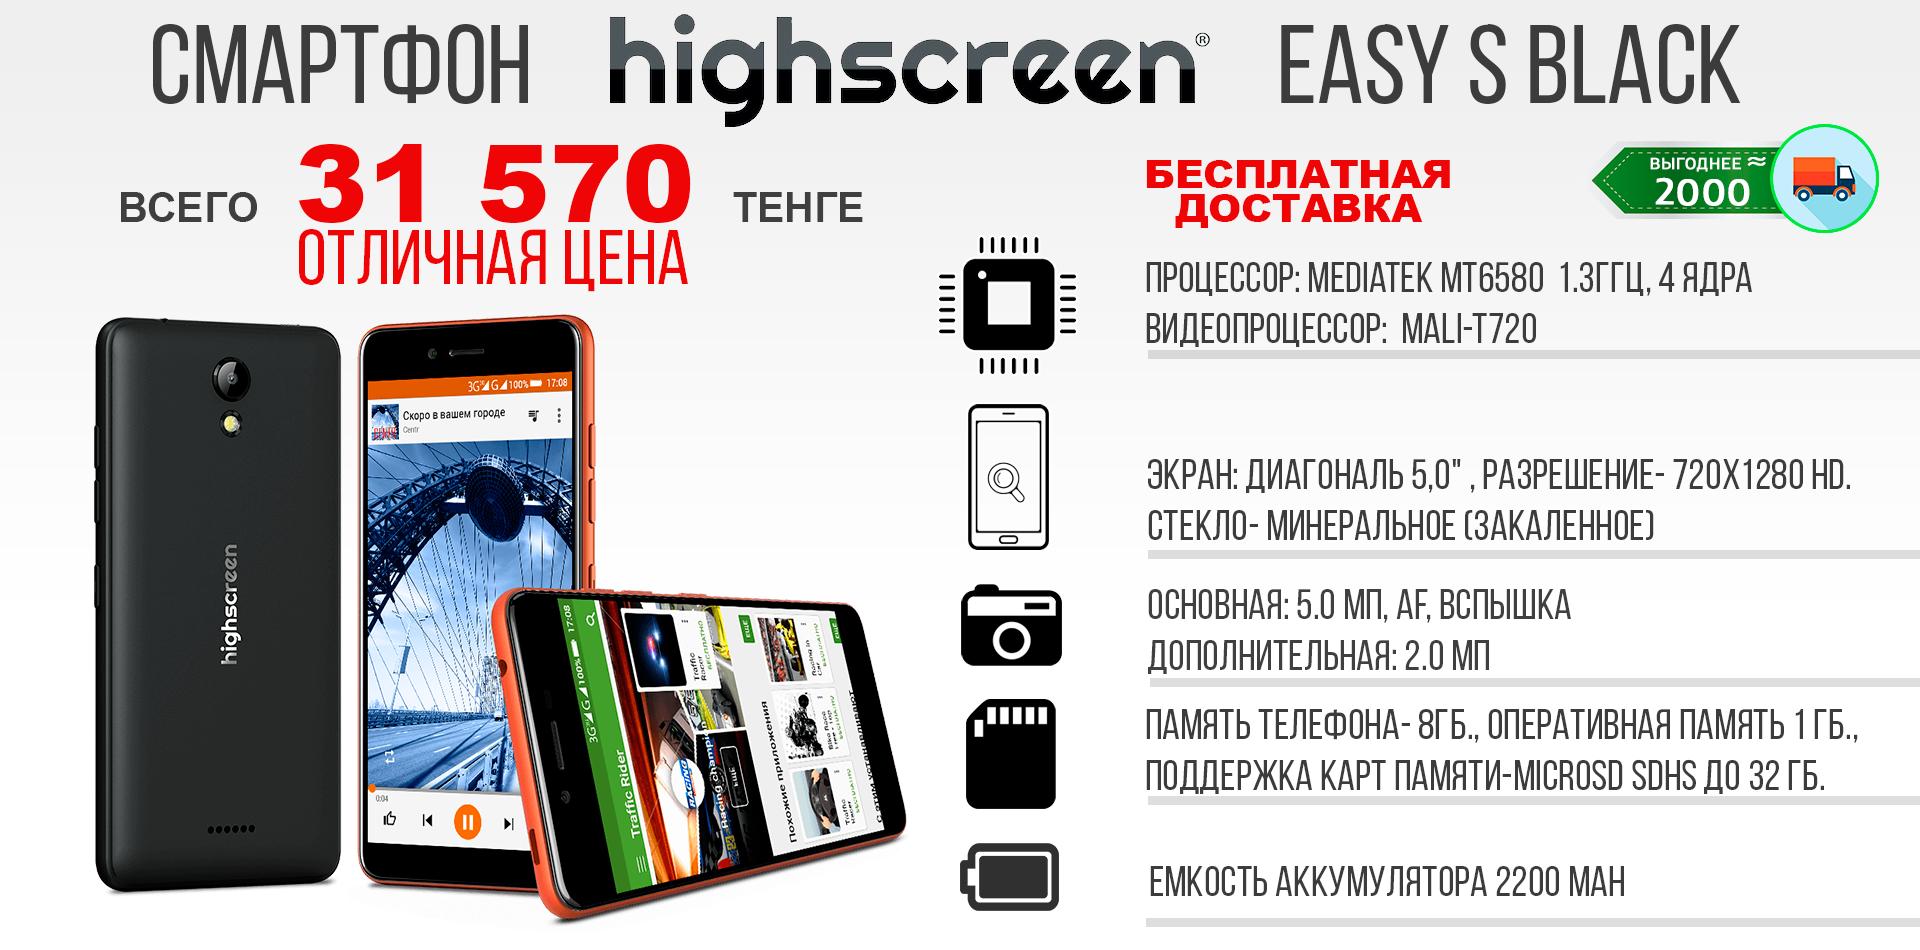 Смартфон Highscreen Easy S Black